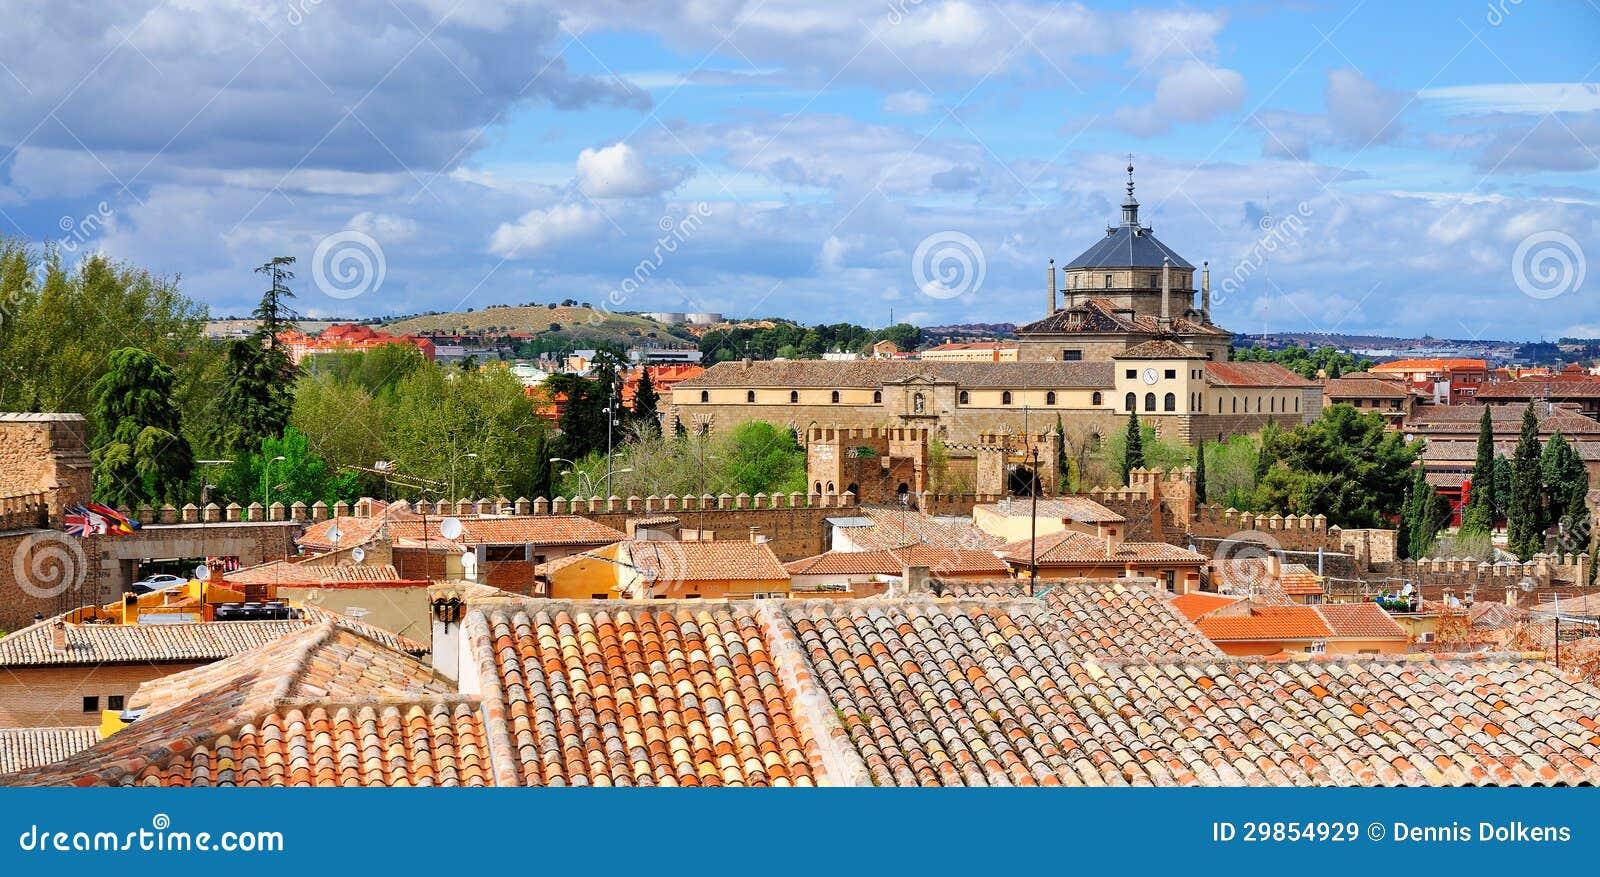 Hospital De Tavera And City Walls, Toledo Royalty Free Stock Images - Image: ...